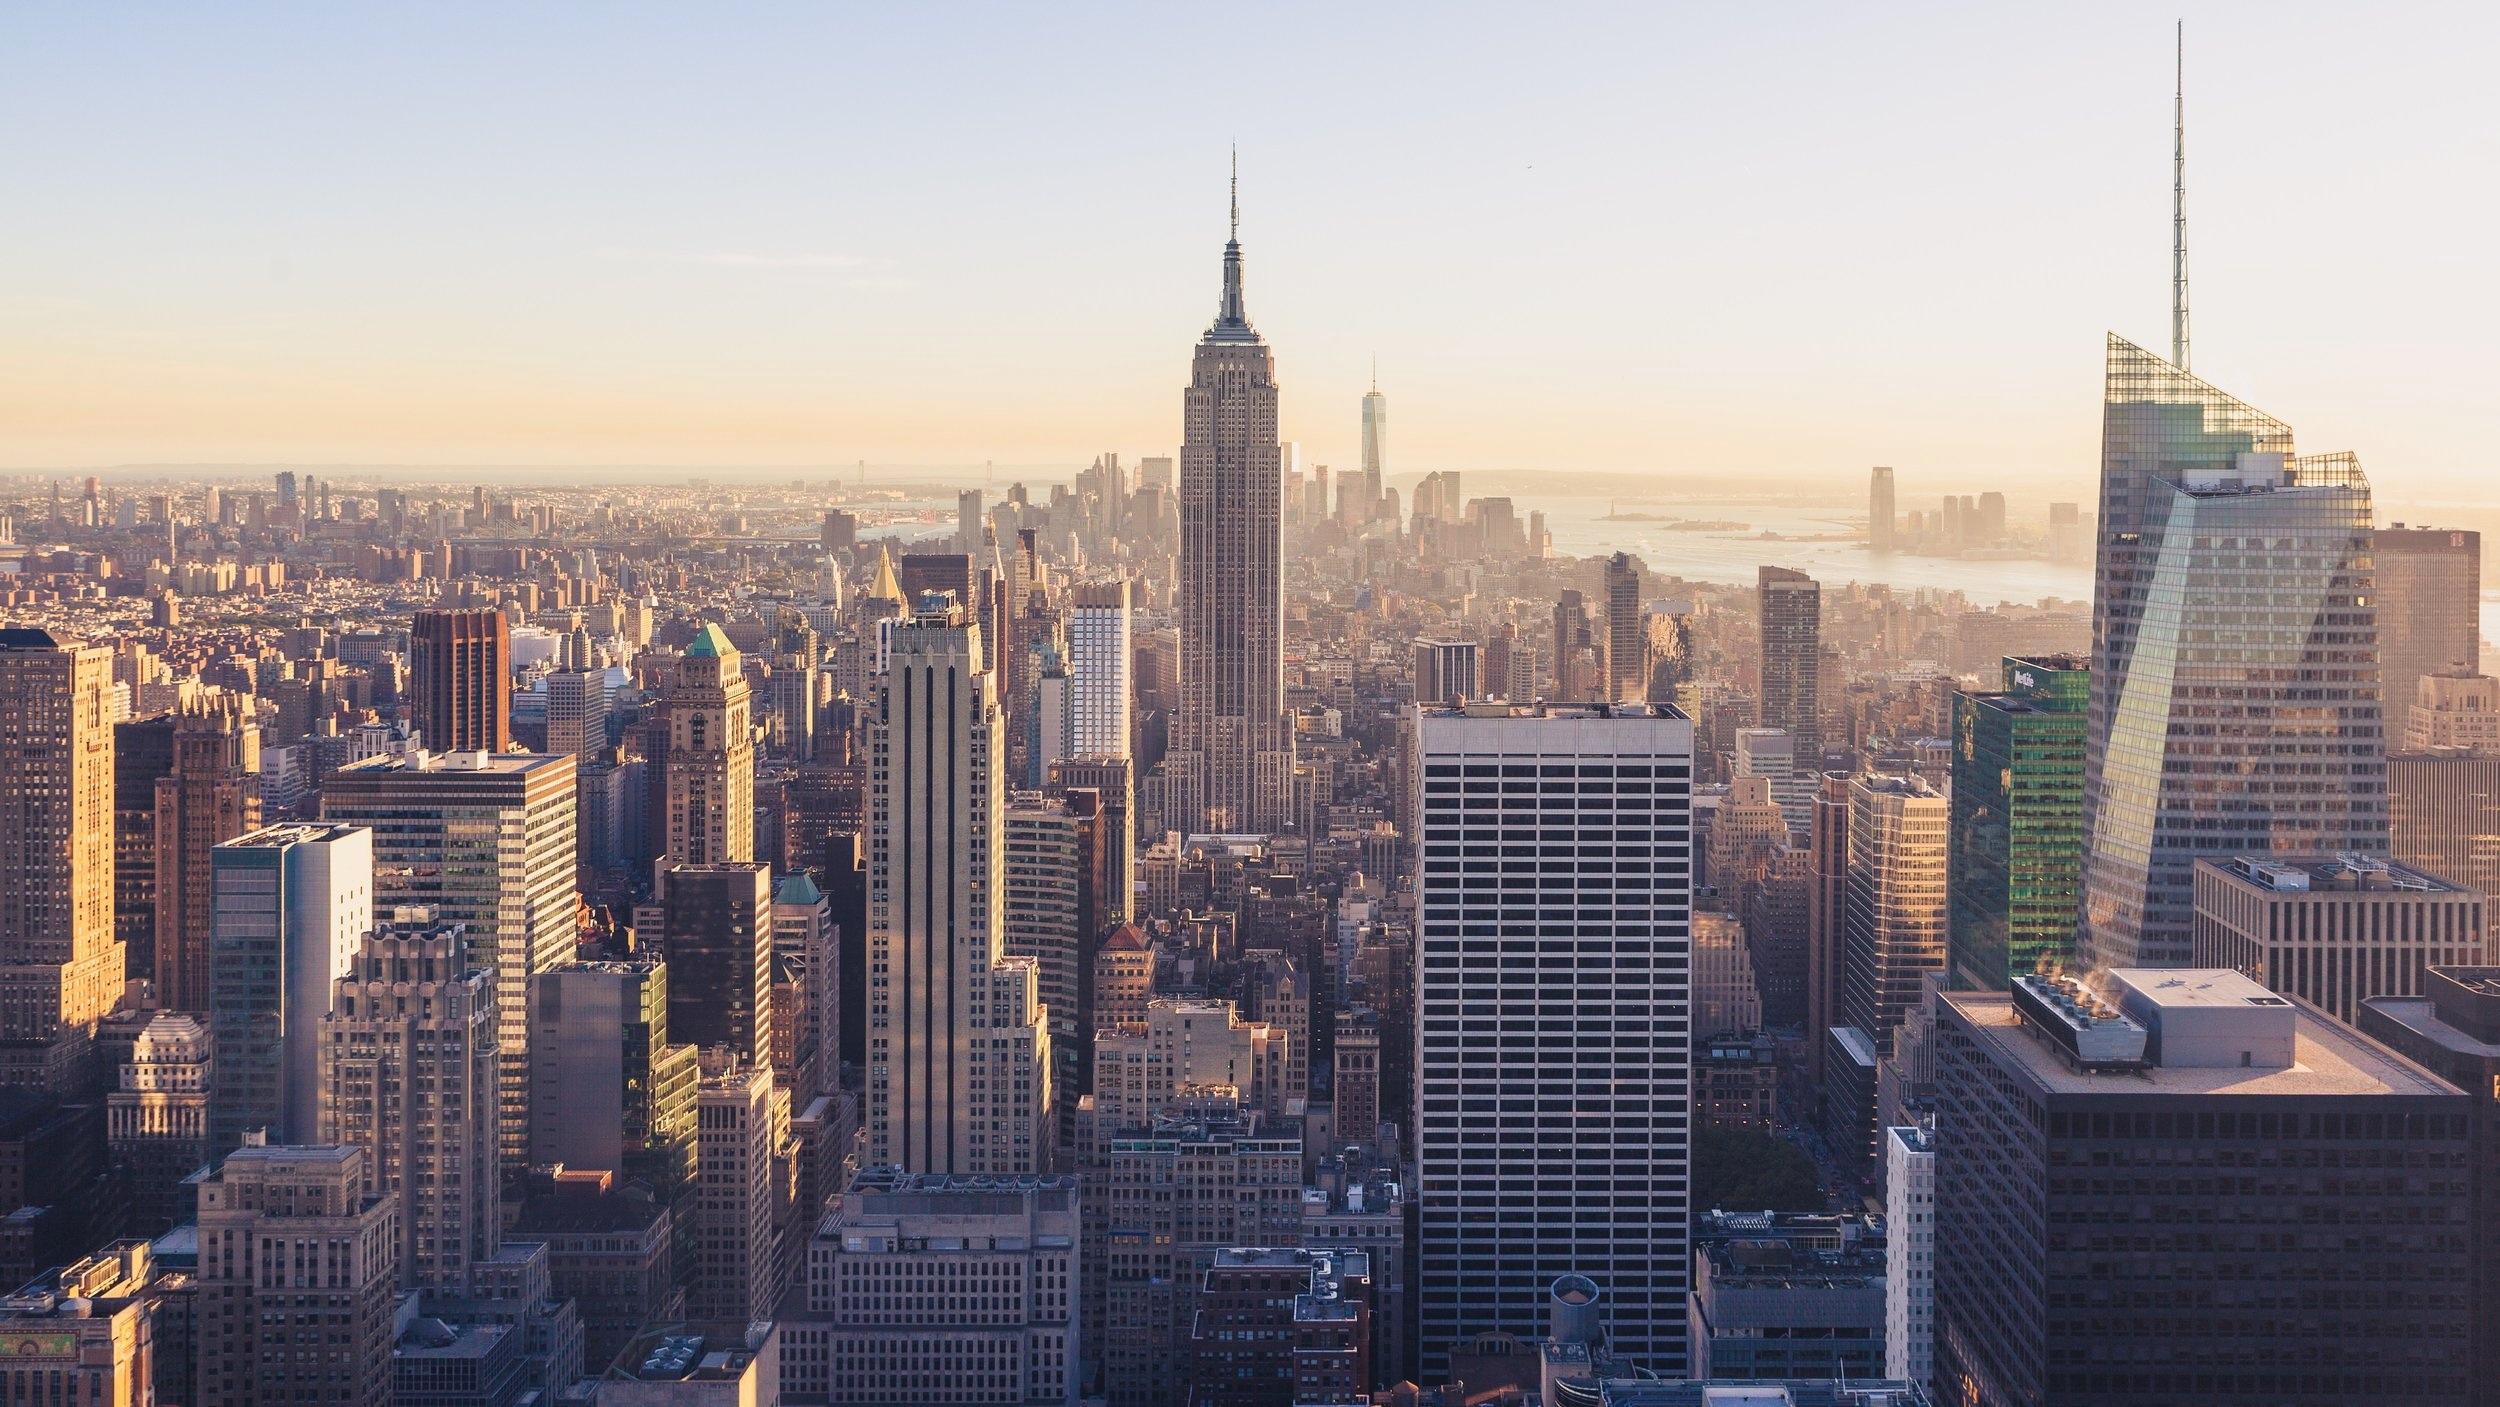 NEW YORK - 5.30.19